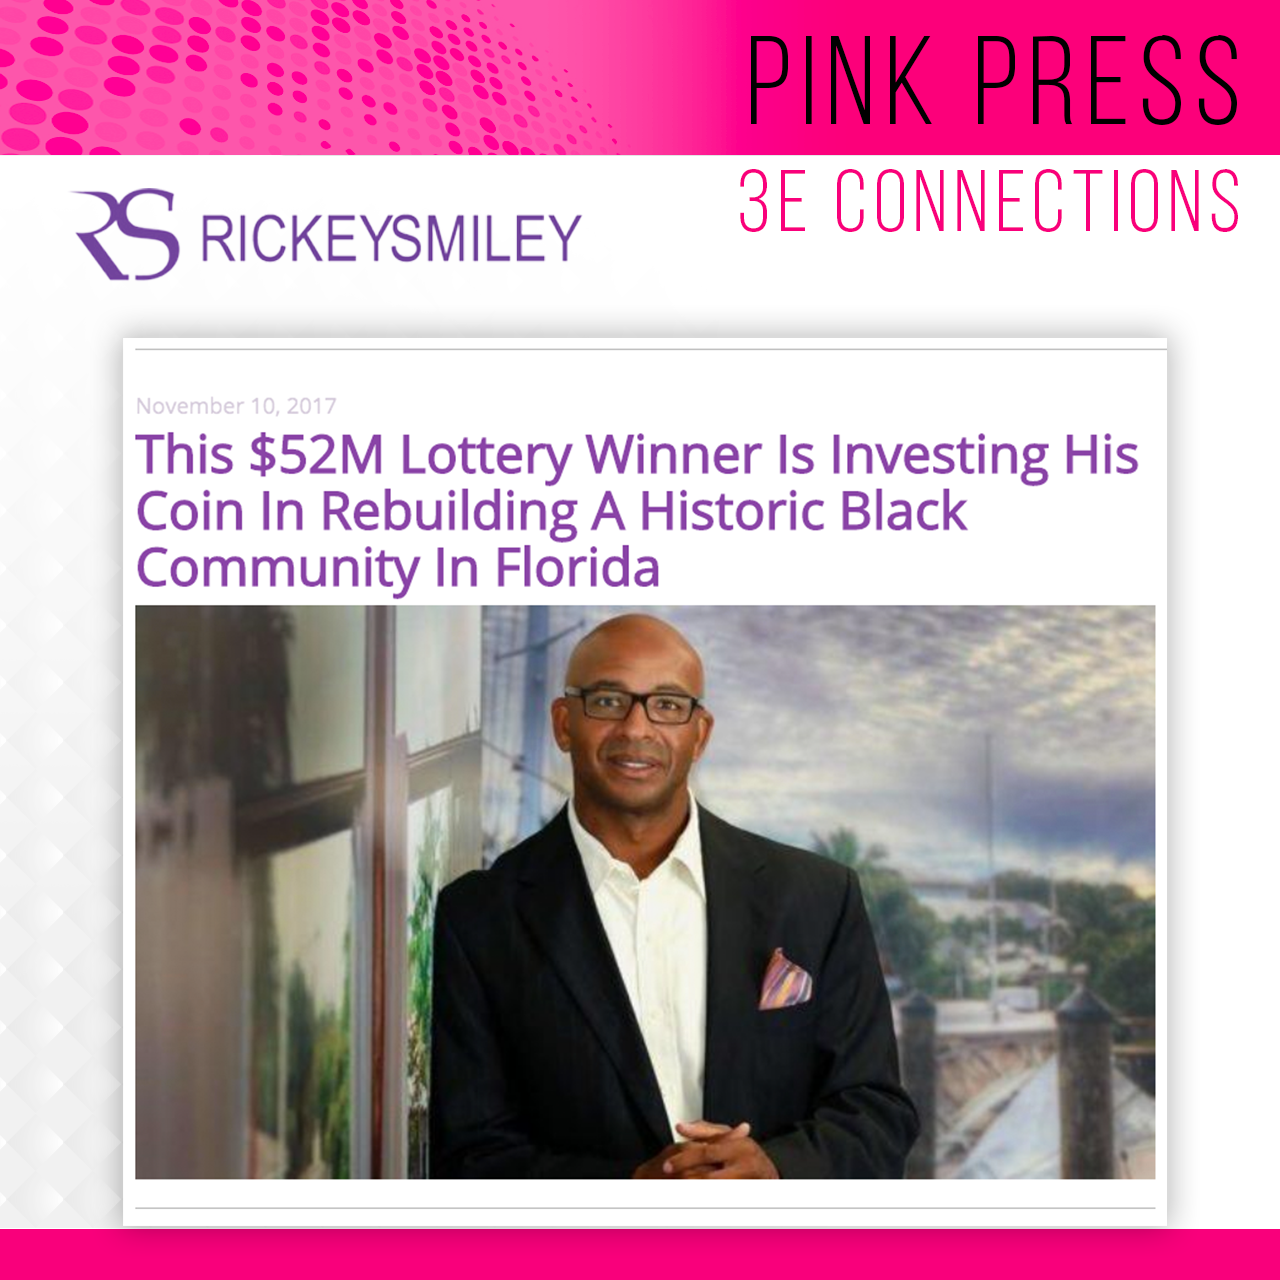 PinkPress_RickeySmiley.png